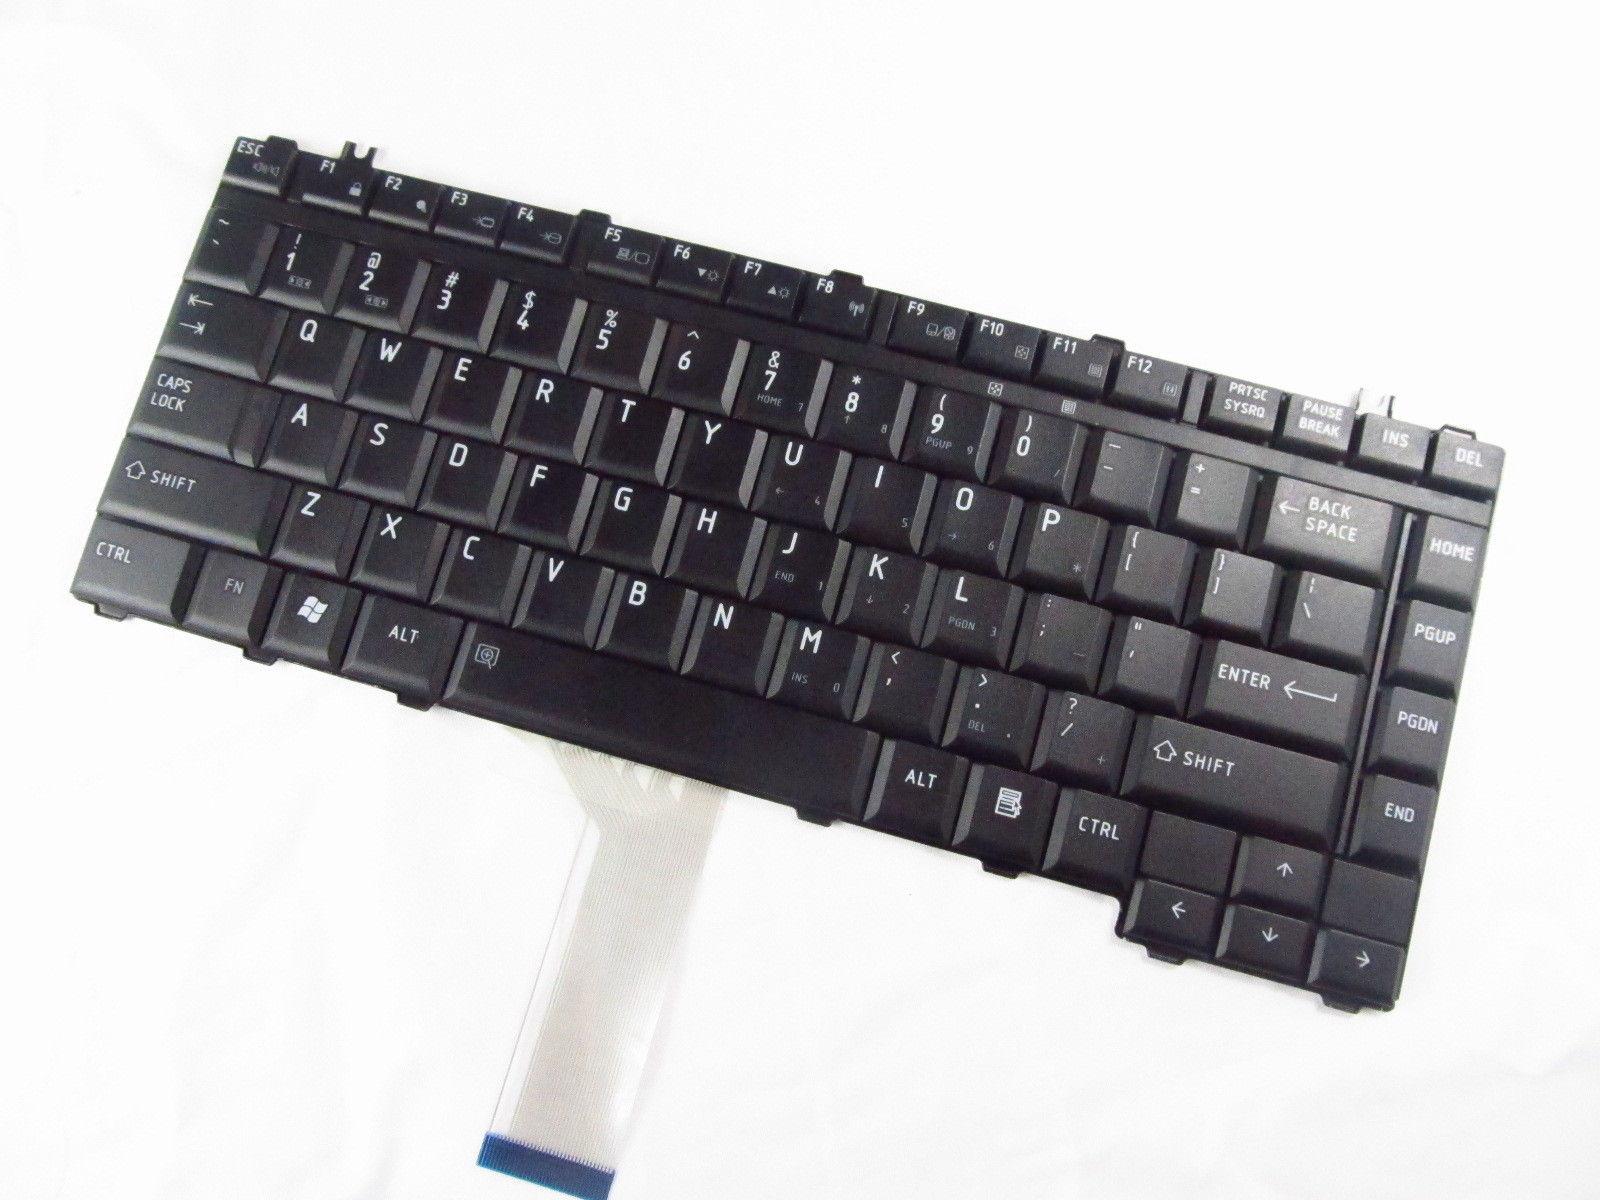 Teclado negro para ordenador portátil TOSHIBA A305-S6898 US